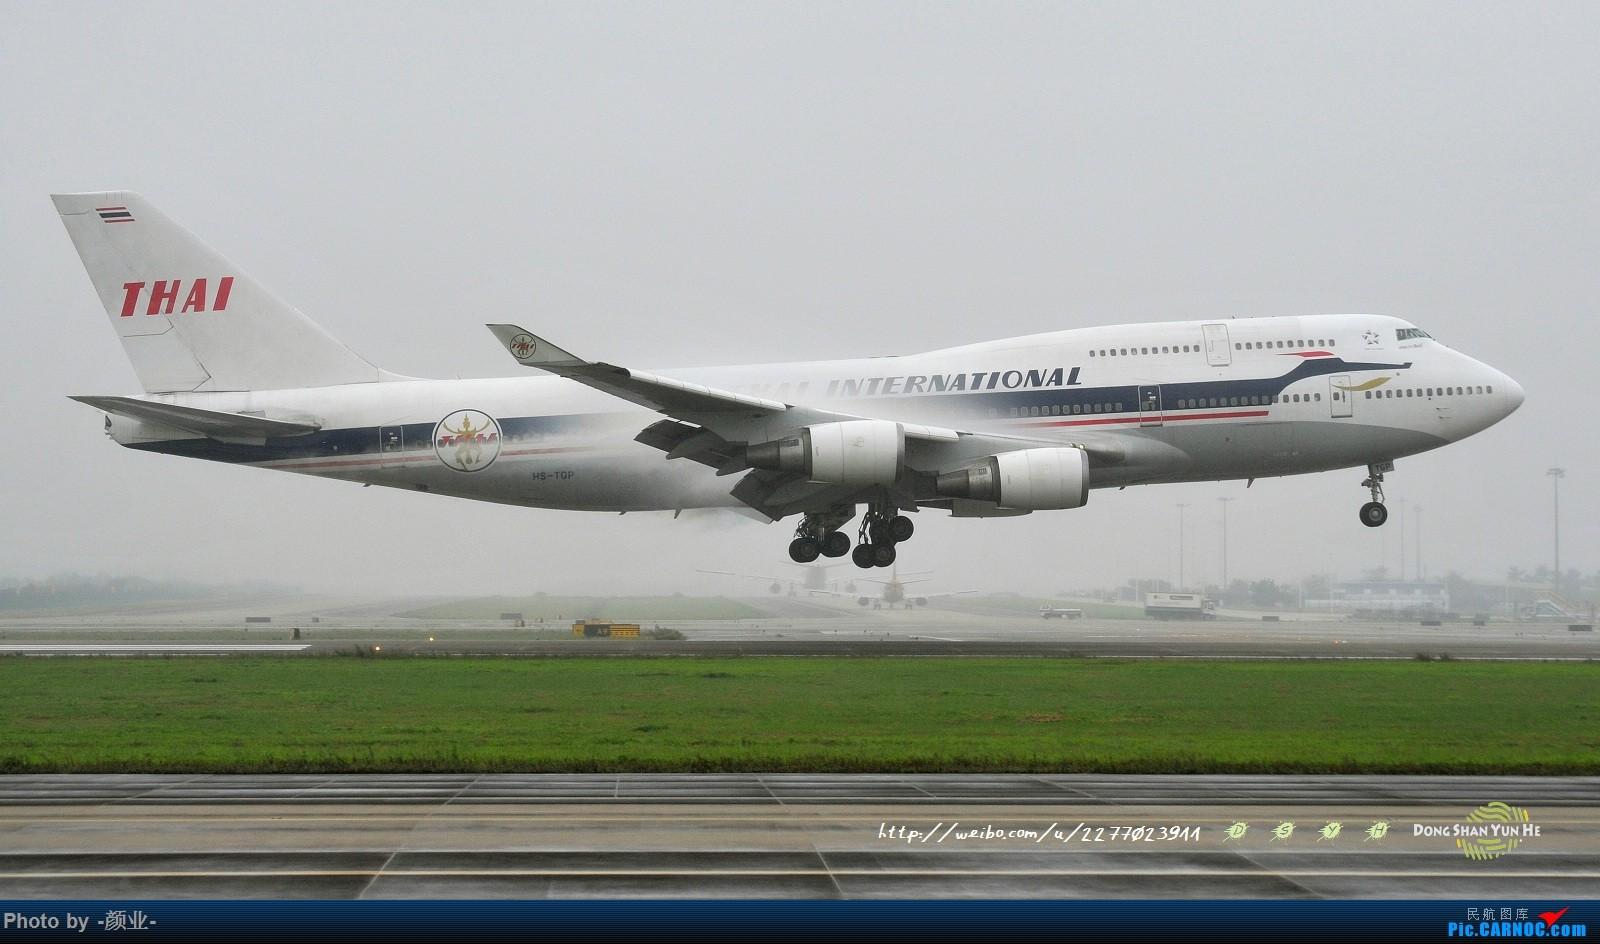 Re:[原创]我的打灰机心情[广州] BOEING 747-400 HS-TGP 中国广州白云国际机场